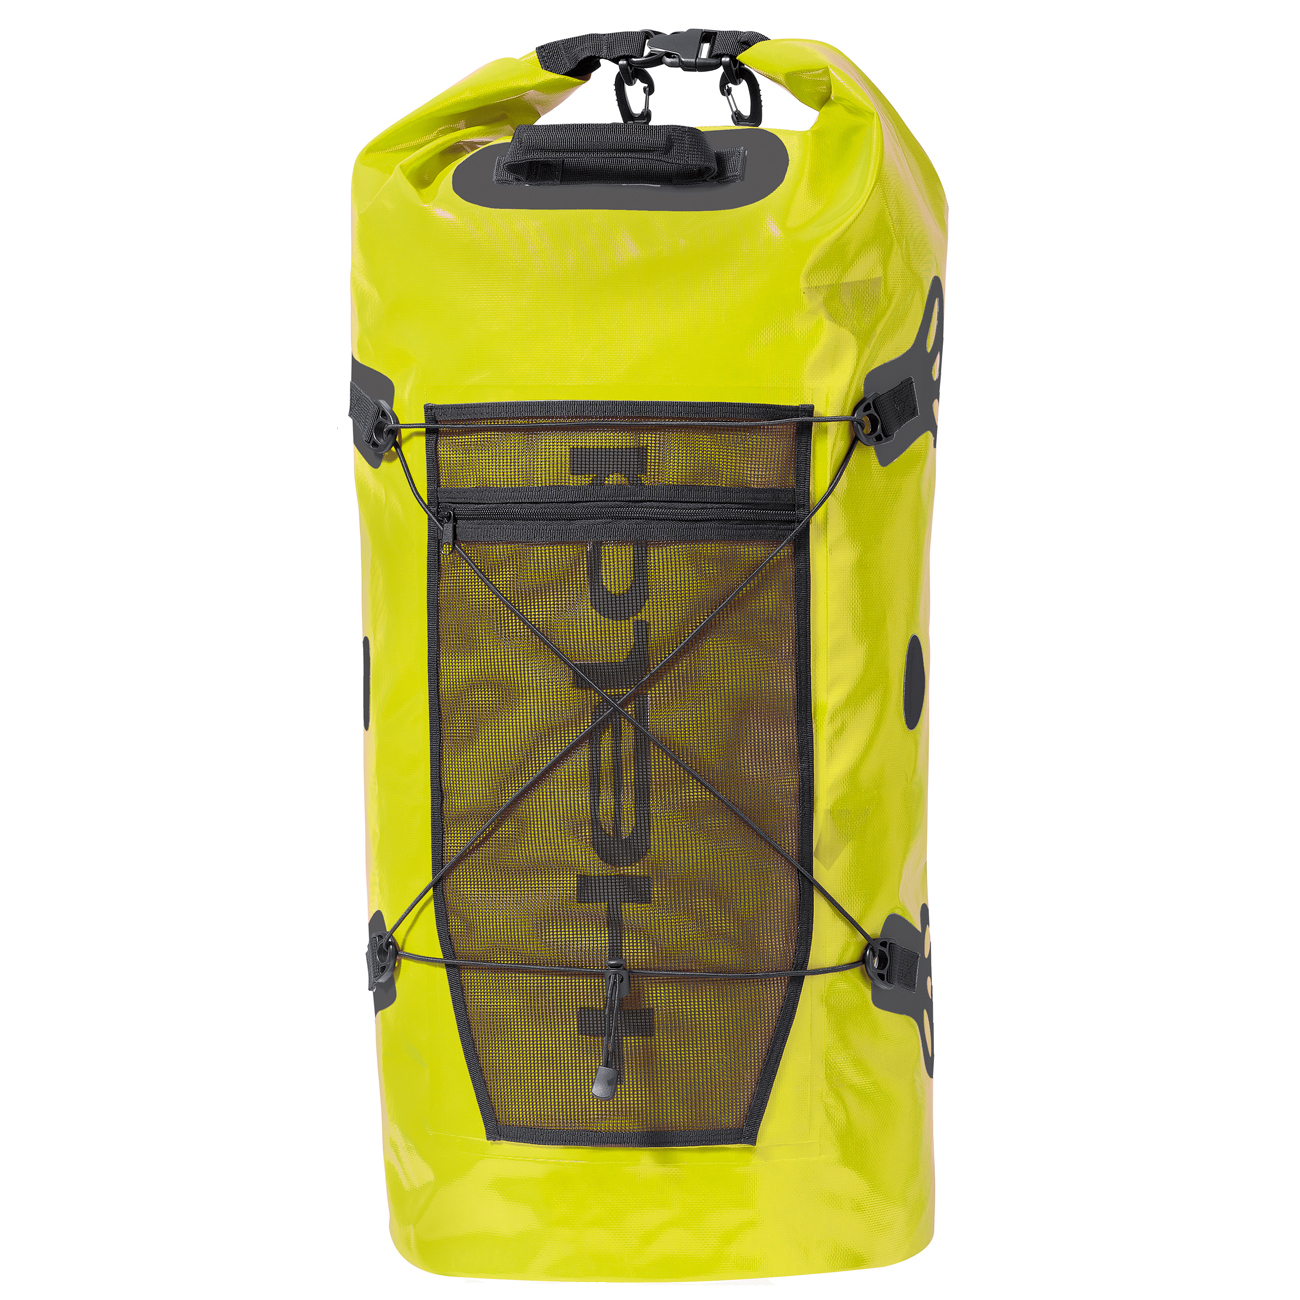 Held Roll-Bag Yellow 60L